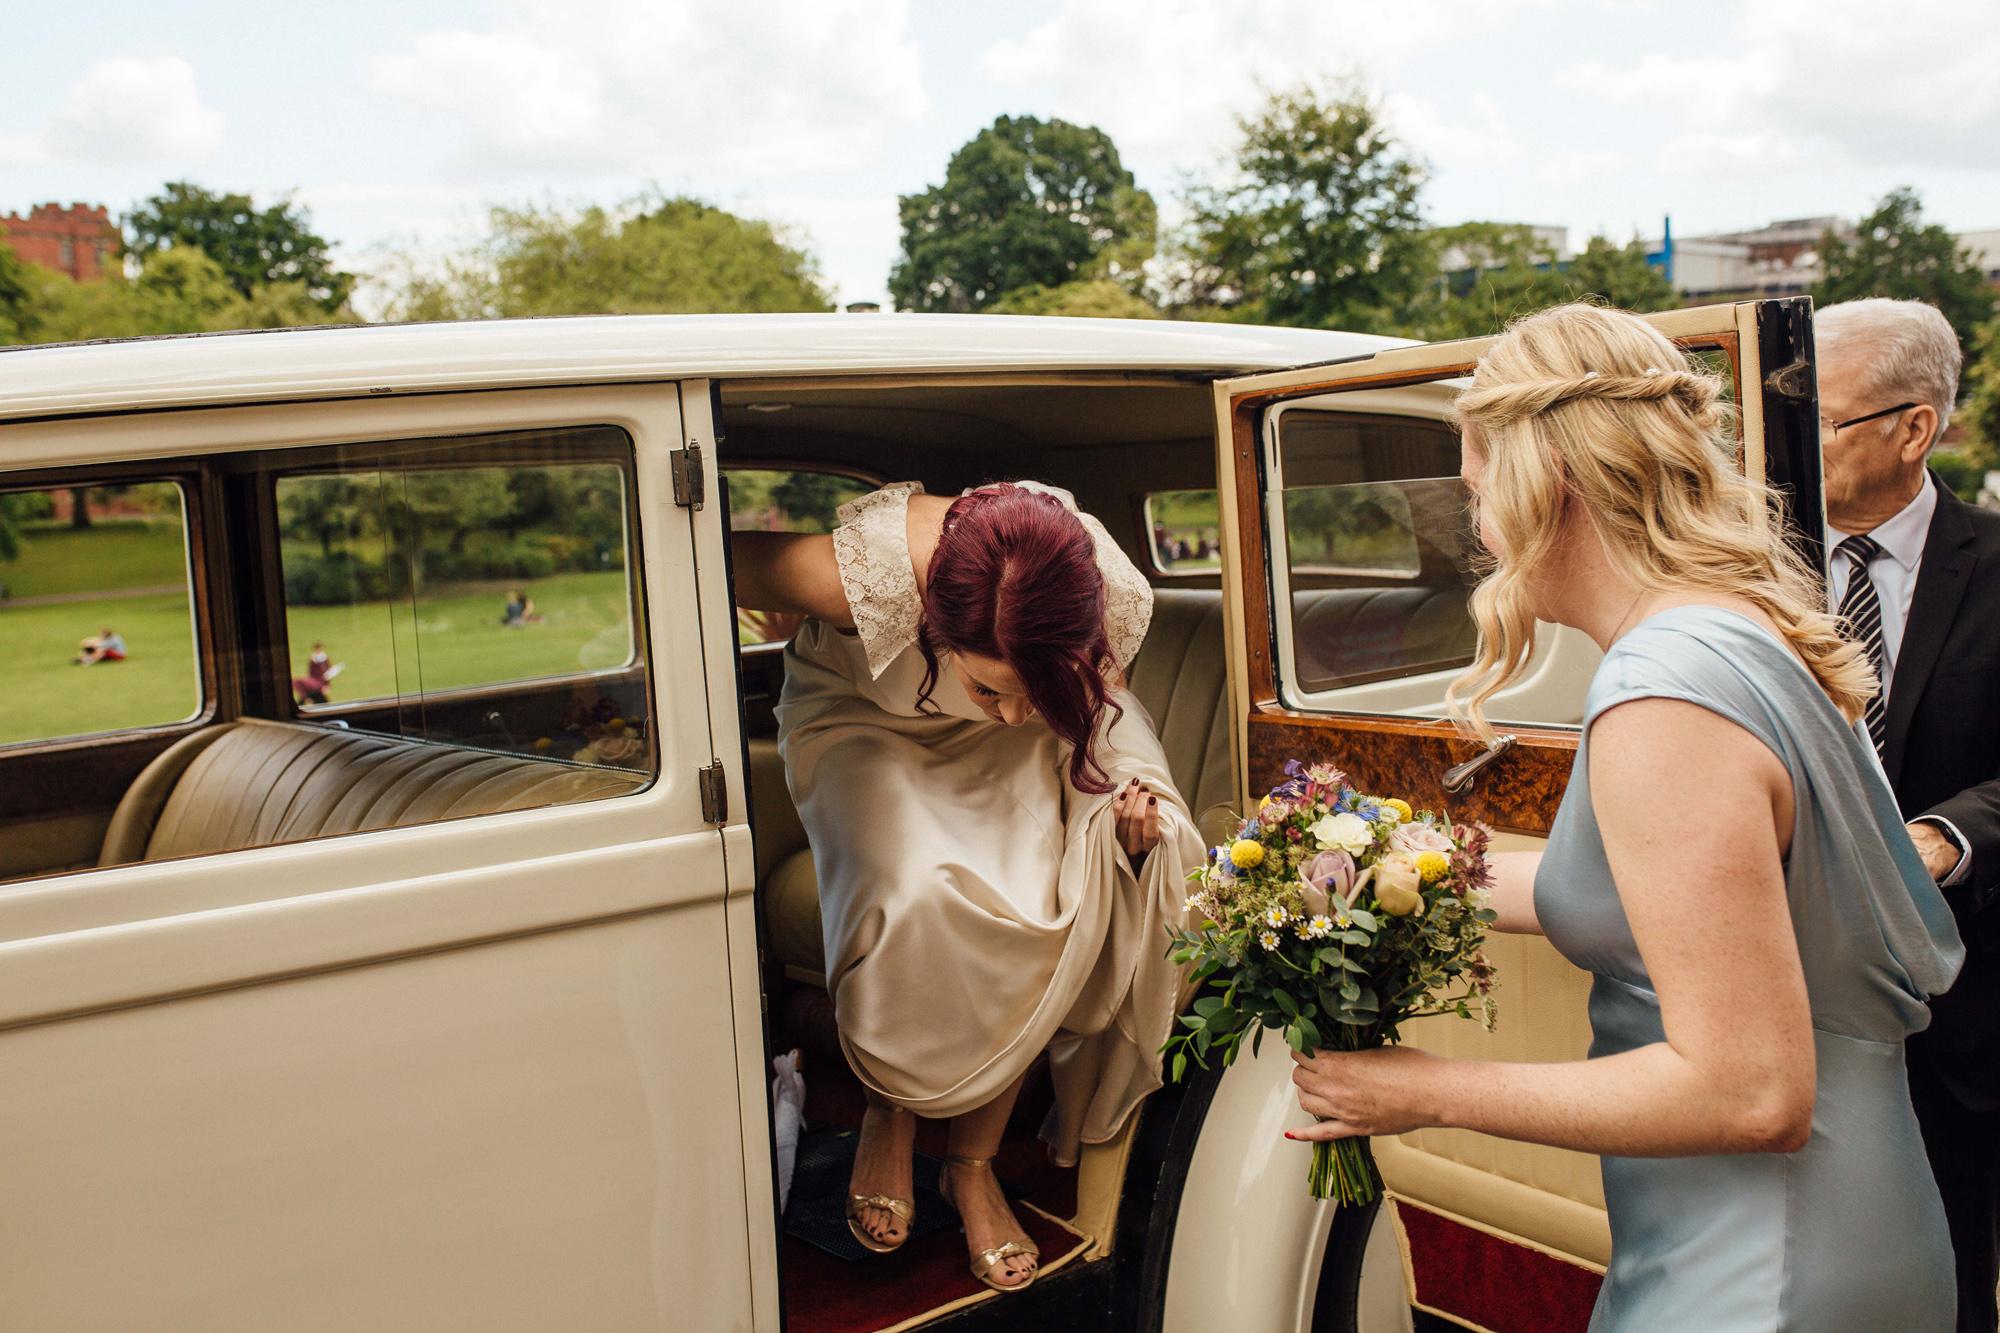 Sarah-Honeysuckle-Bias-Cut-Silk-Vintage-Inspired-Wedding-Gown-Sheffield-Wedding-Kate-Beaumont-8.jpg